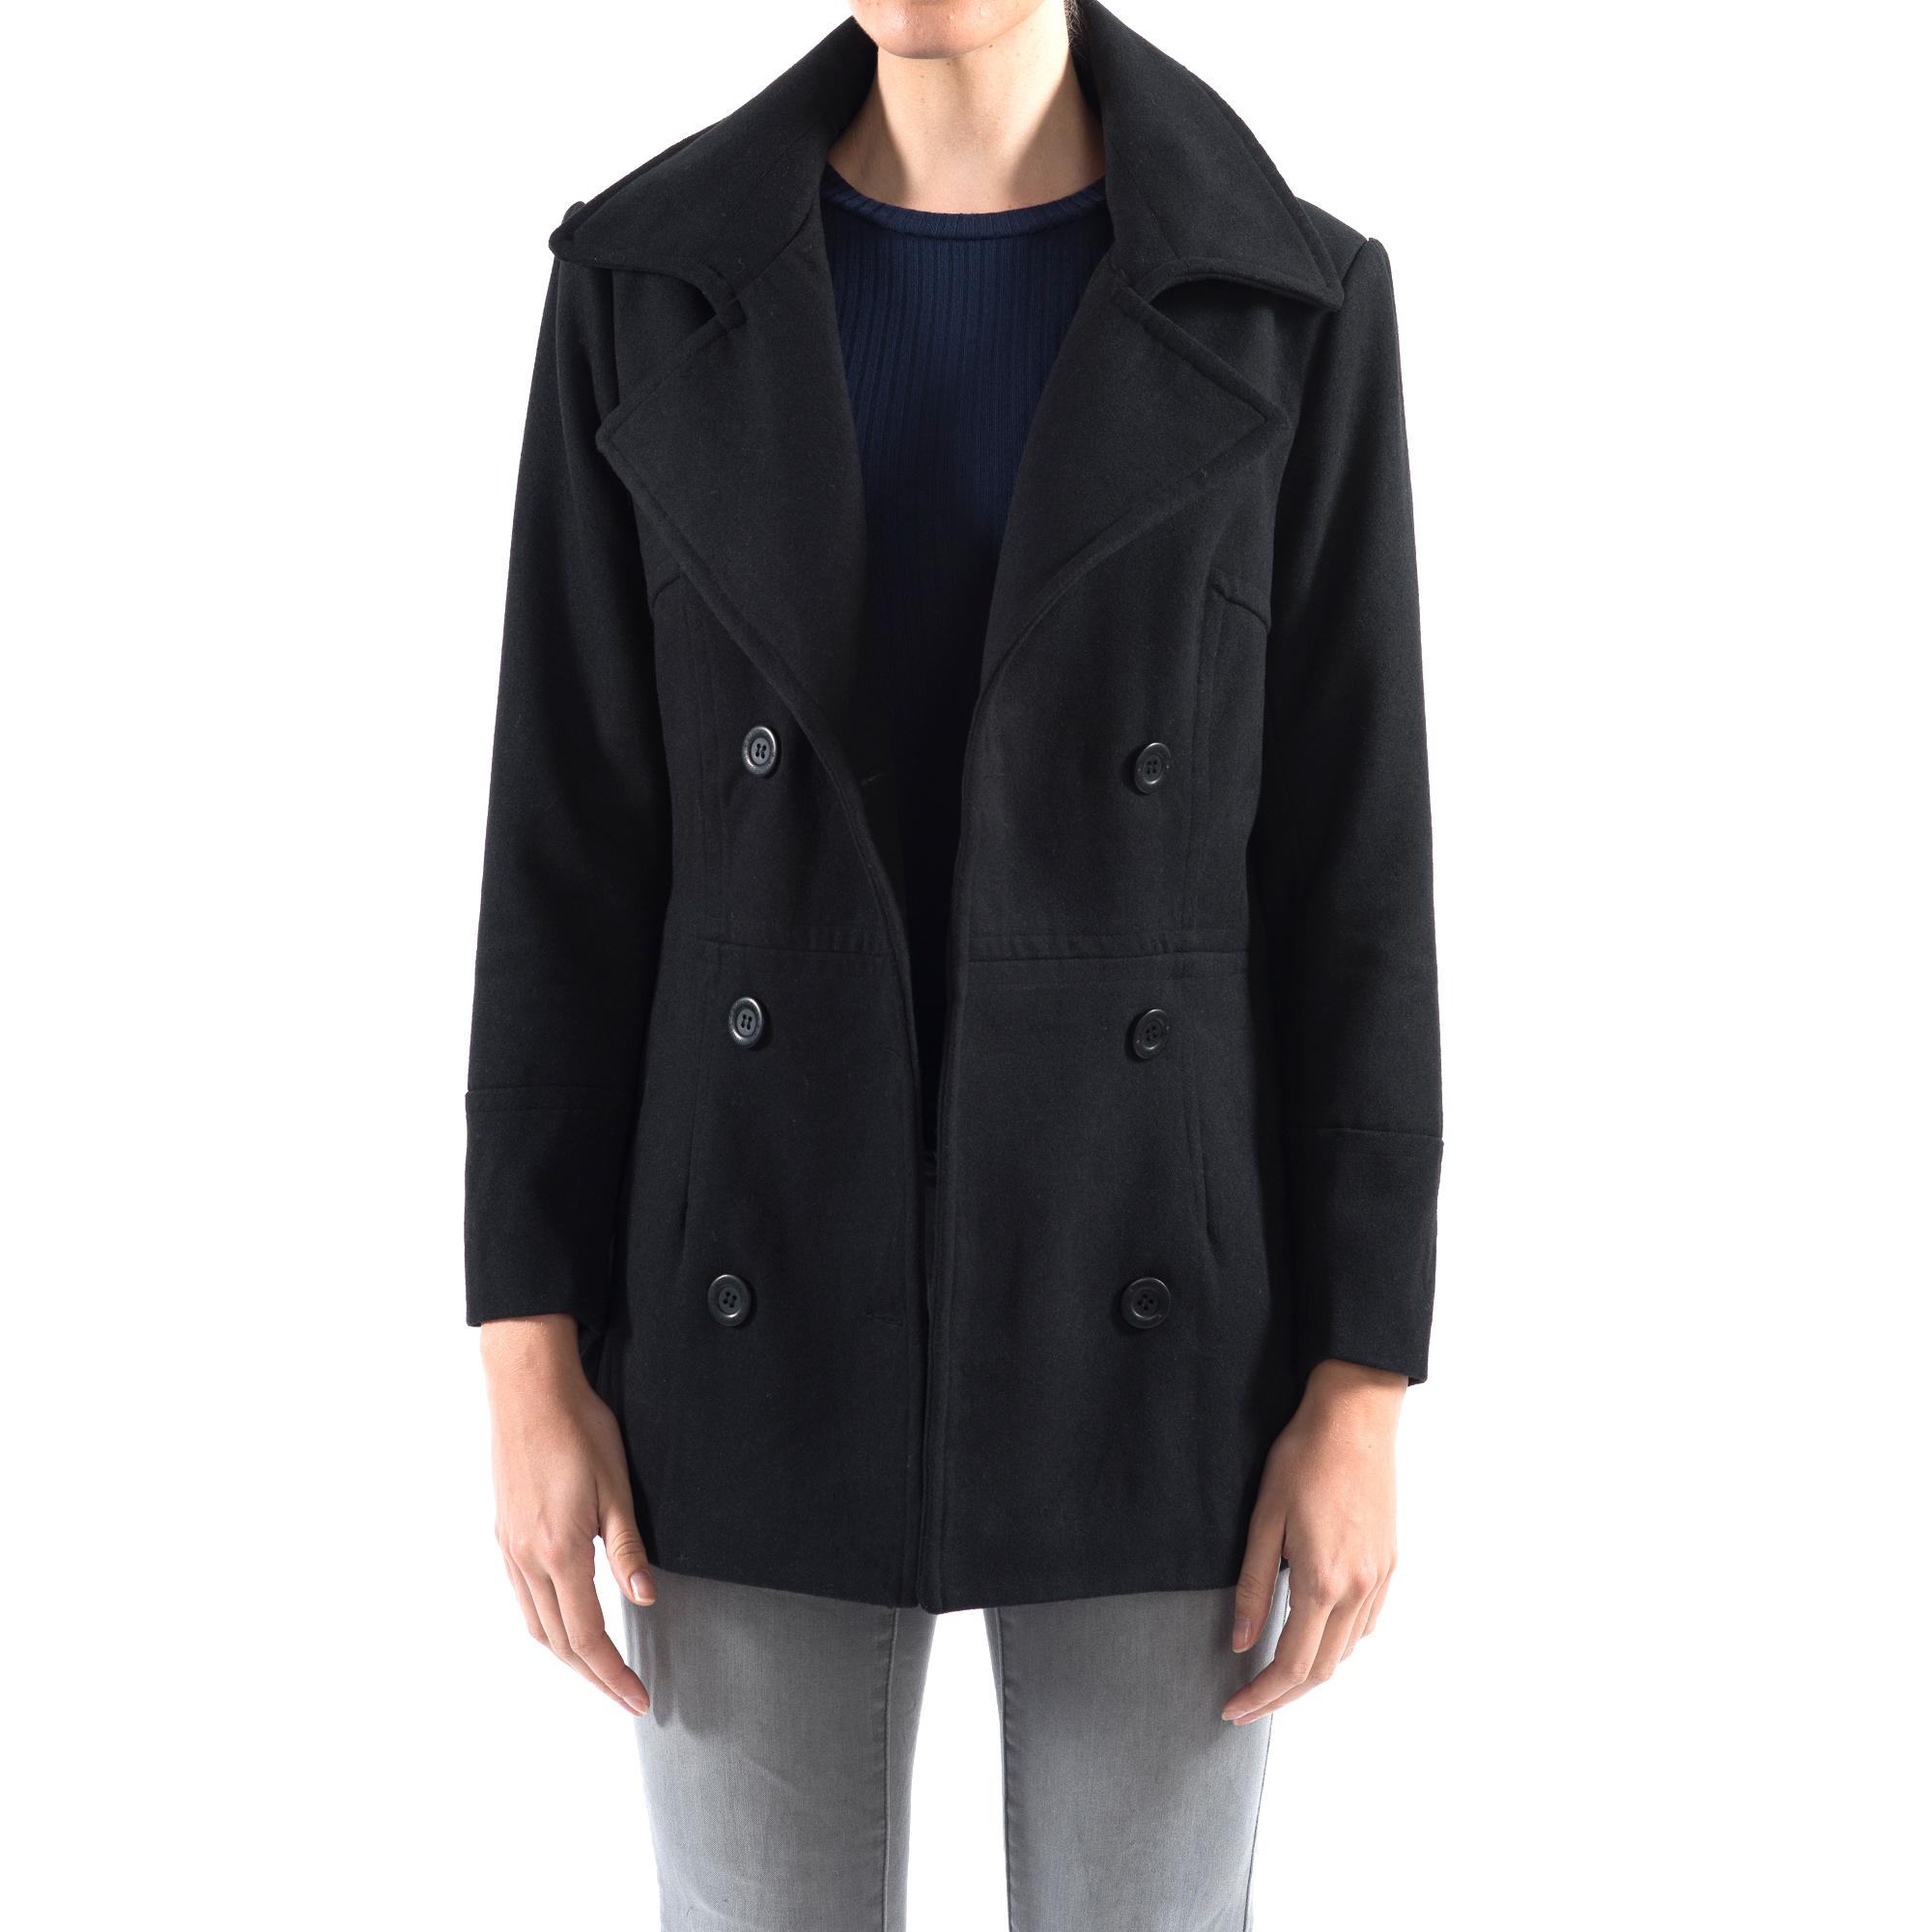 Alpine-Swiss-Emma-Womens-Peacoat-Jacket-Wool-Blazer-Double-Breasted-Overcoat-New thumbnail 15